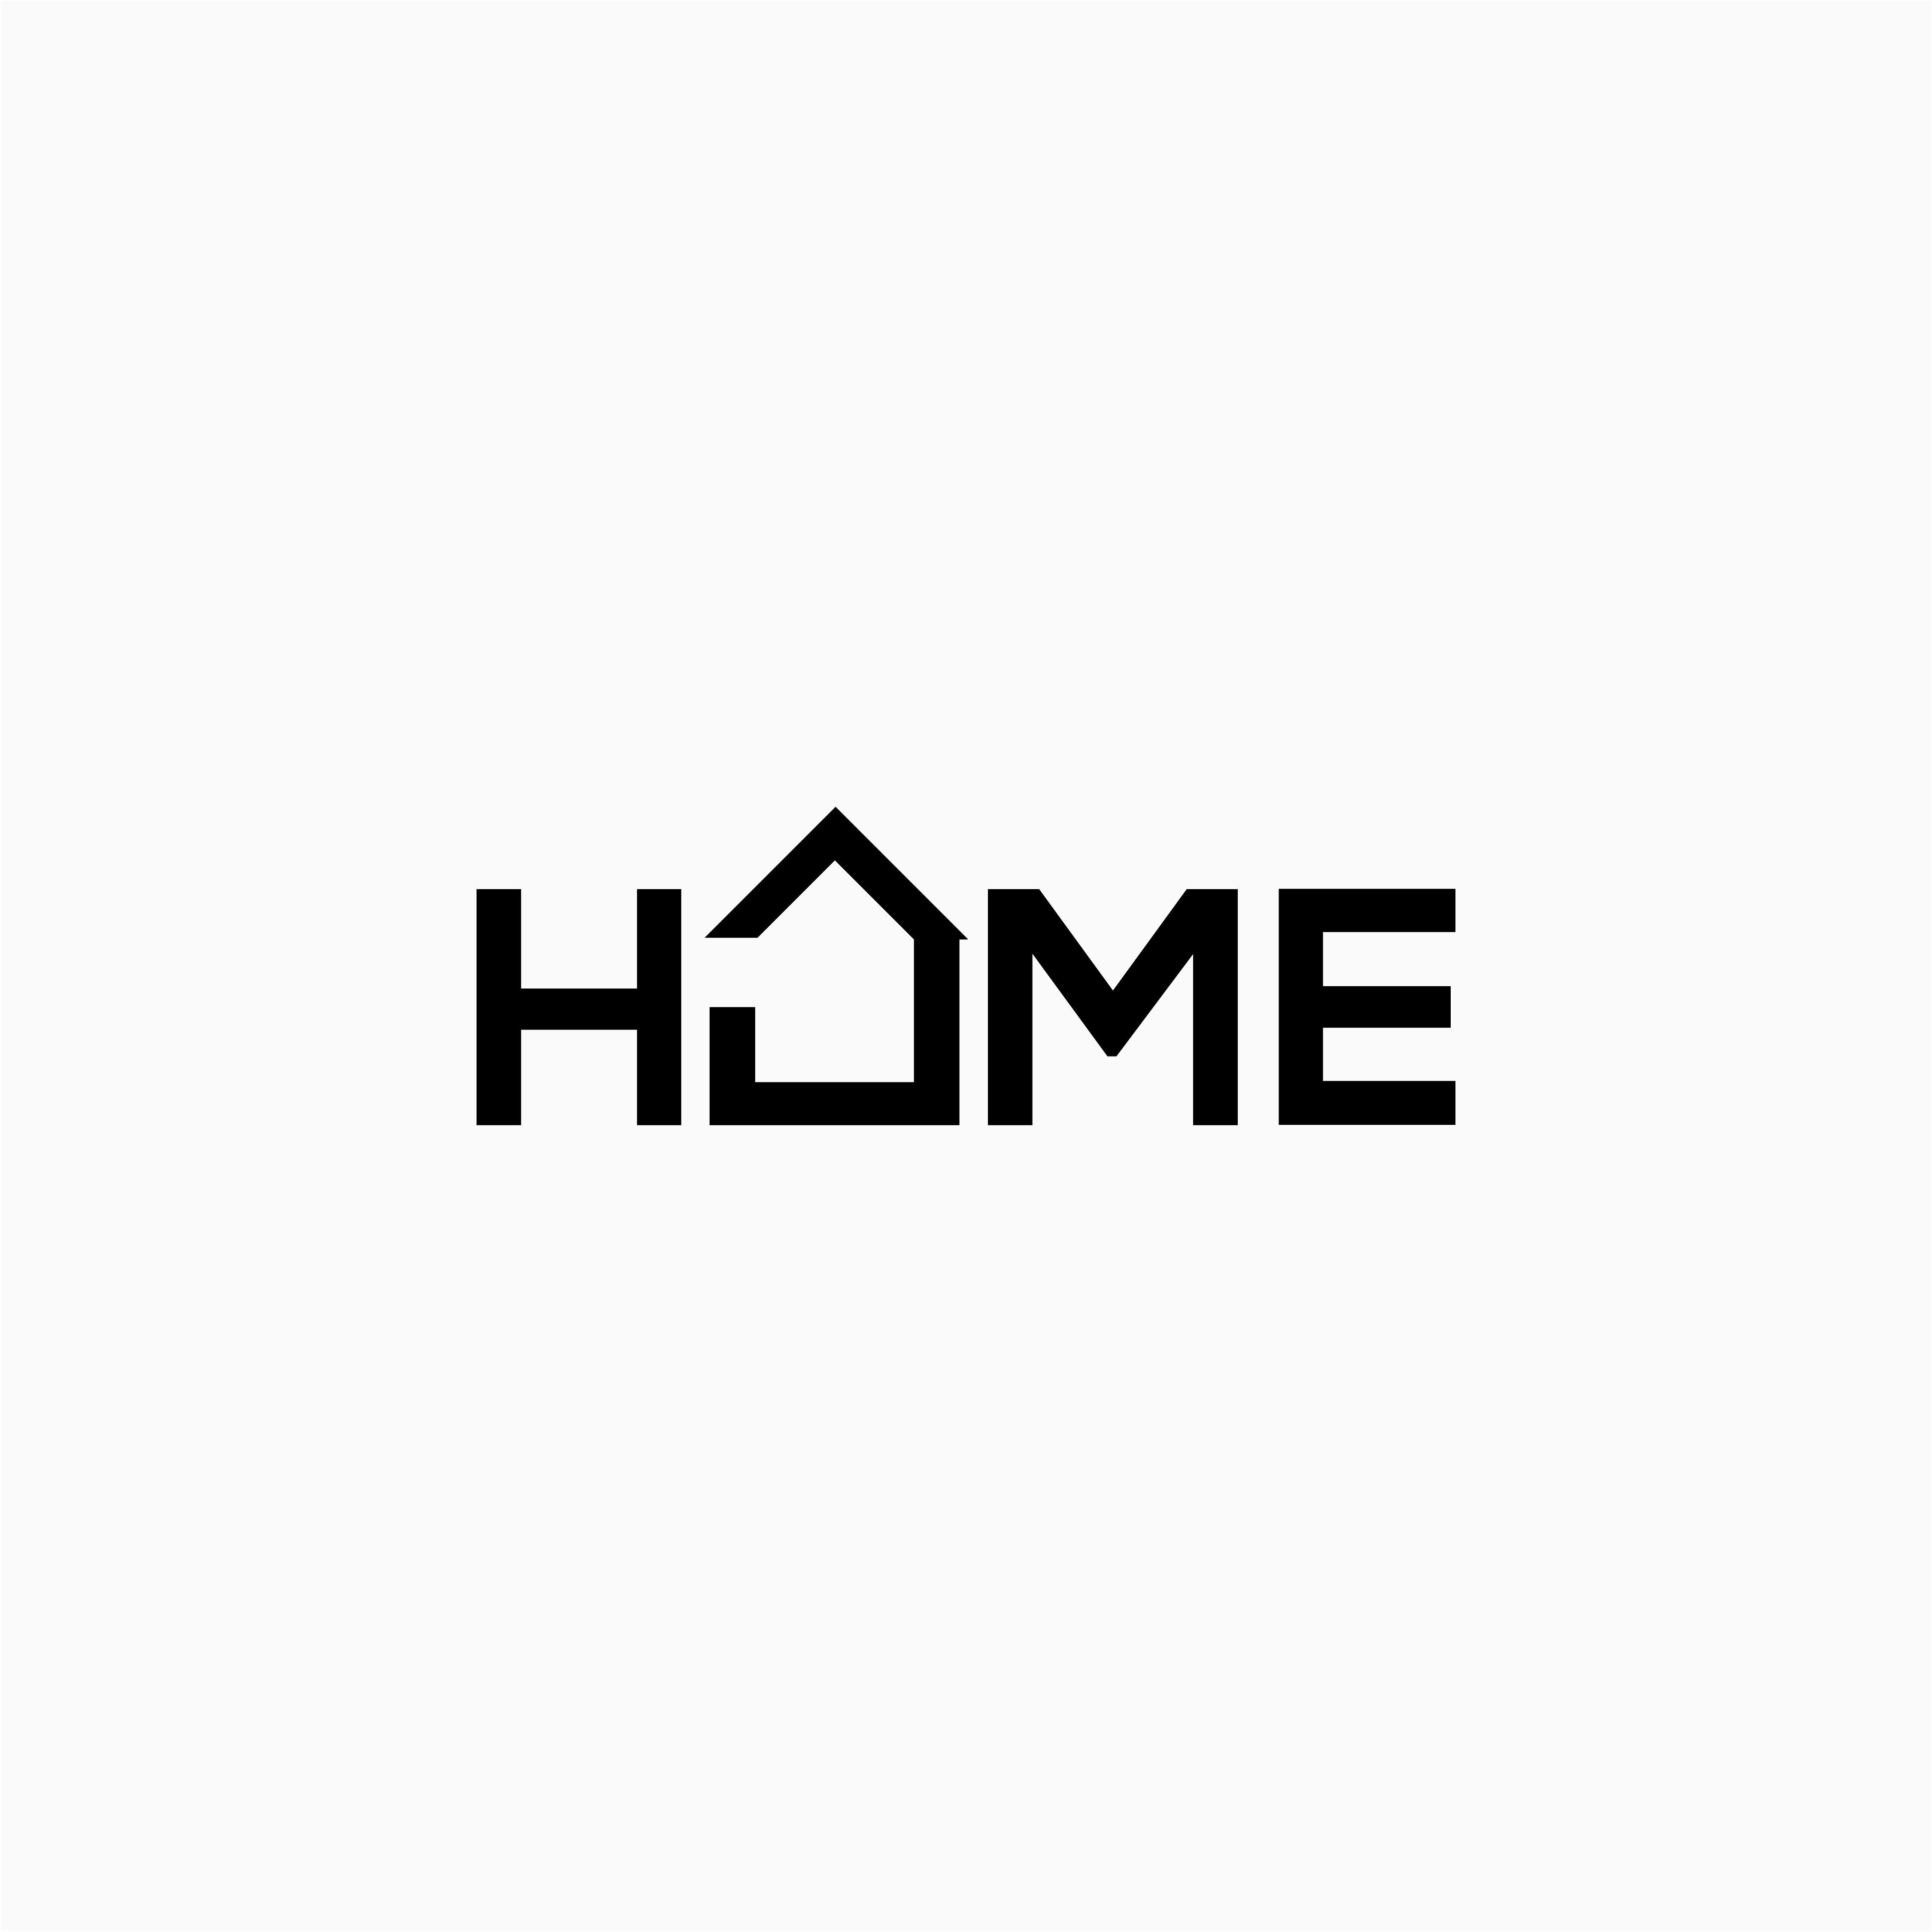 HOME 30/100. Typographic logo design, House logo design